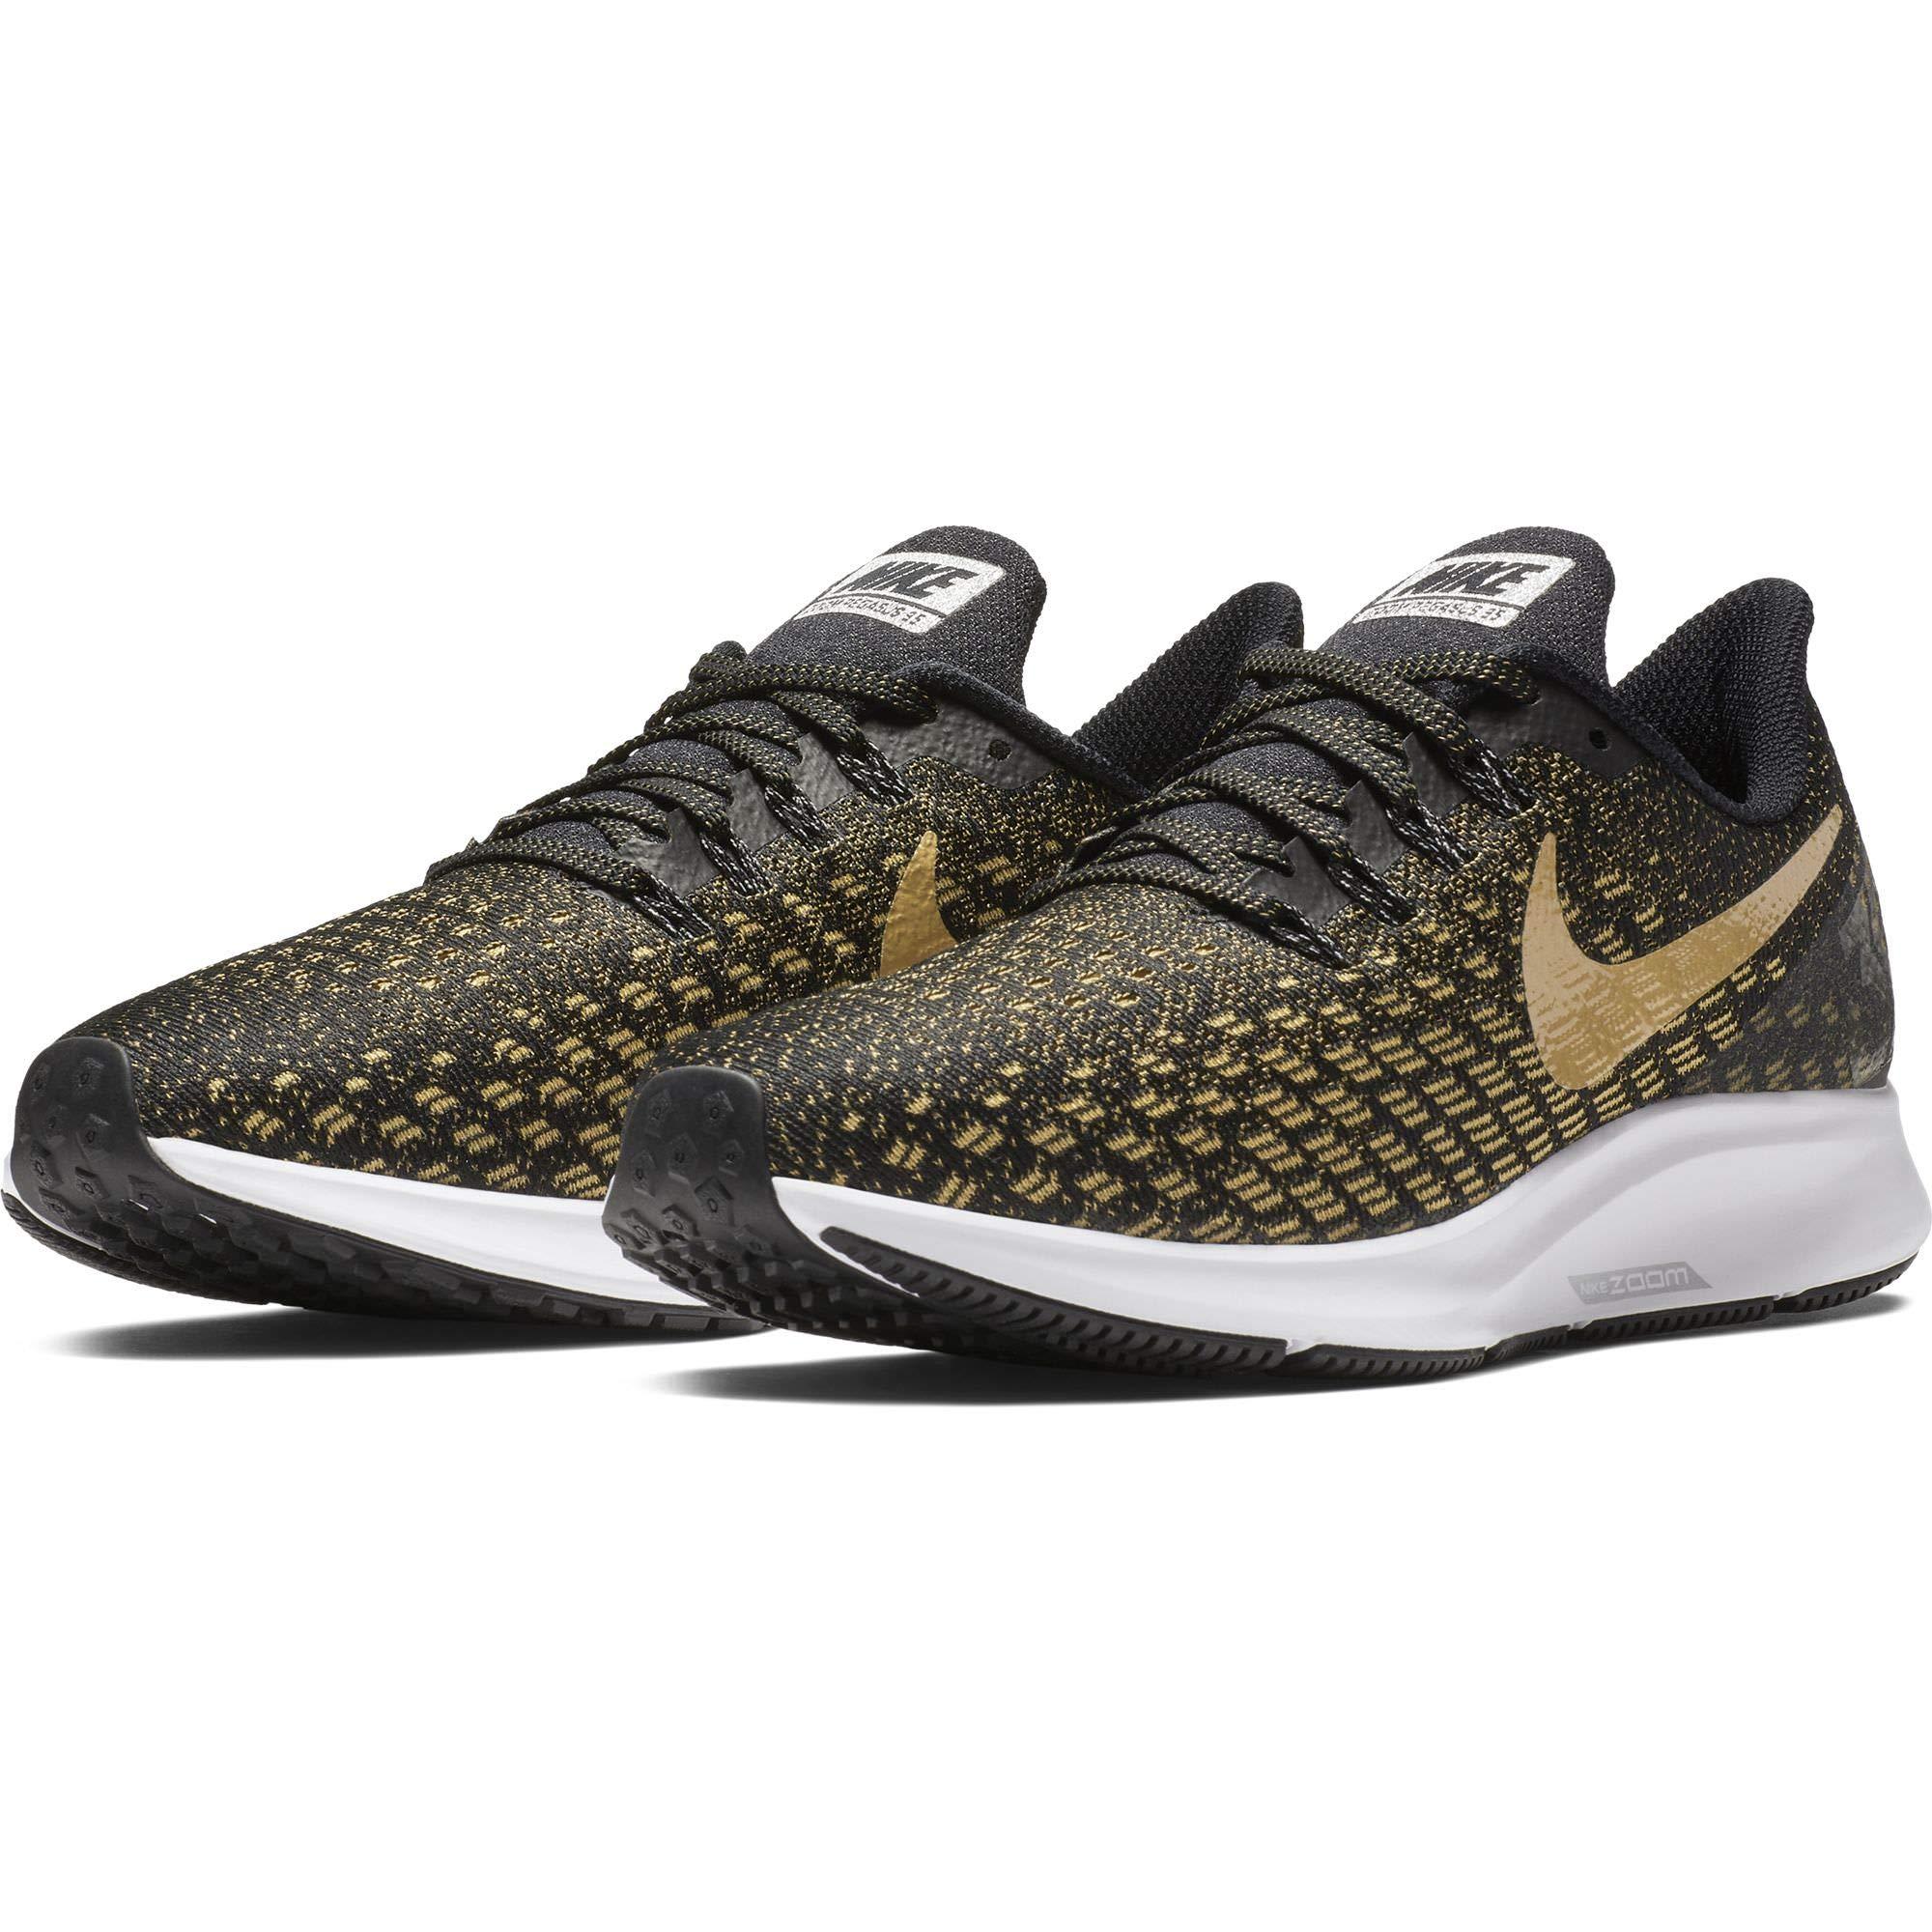 0bb91de1d3ee Galleon - Nike Women s Zoom Pegasus 35 Running Shoe Black Metallic  Gold Wheat Gold Size 7 M US